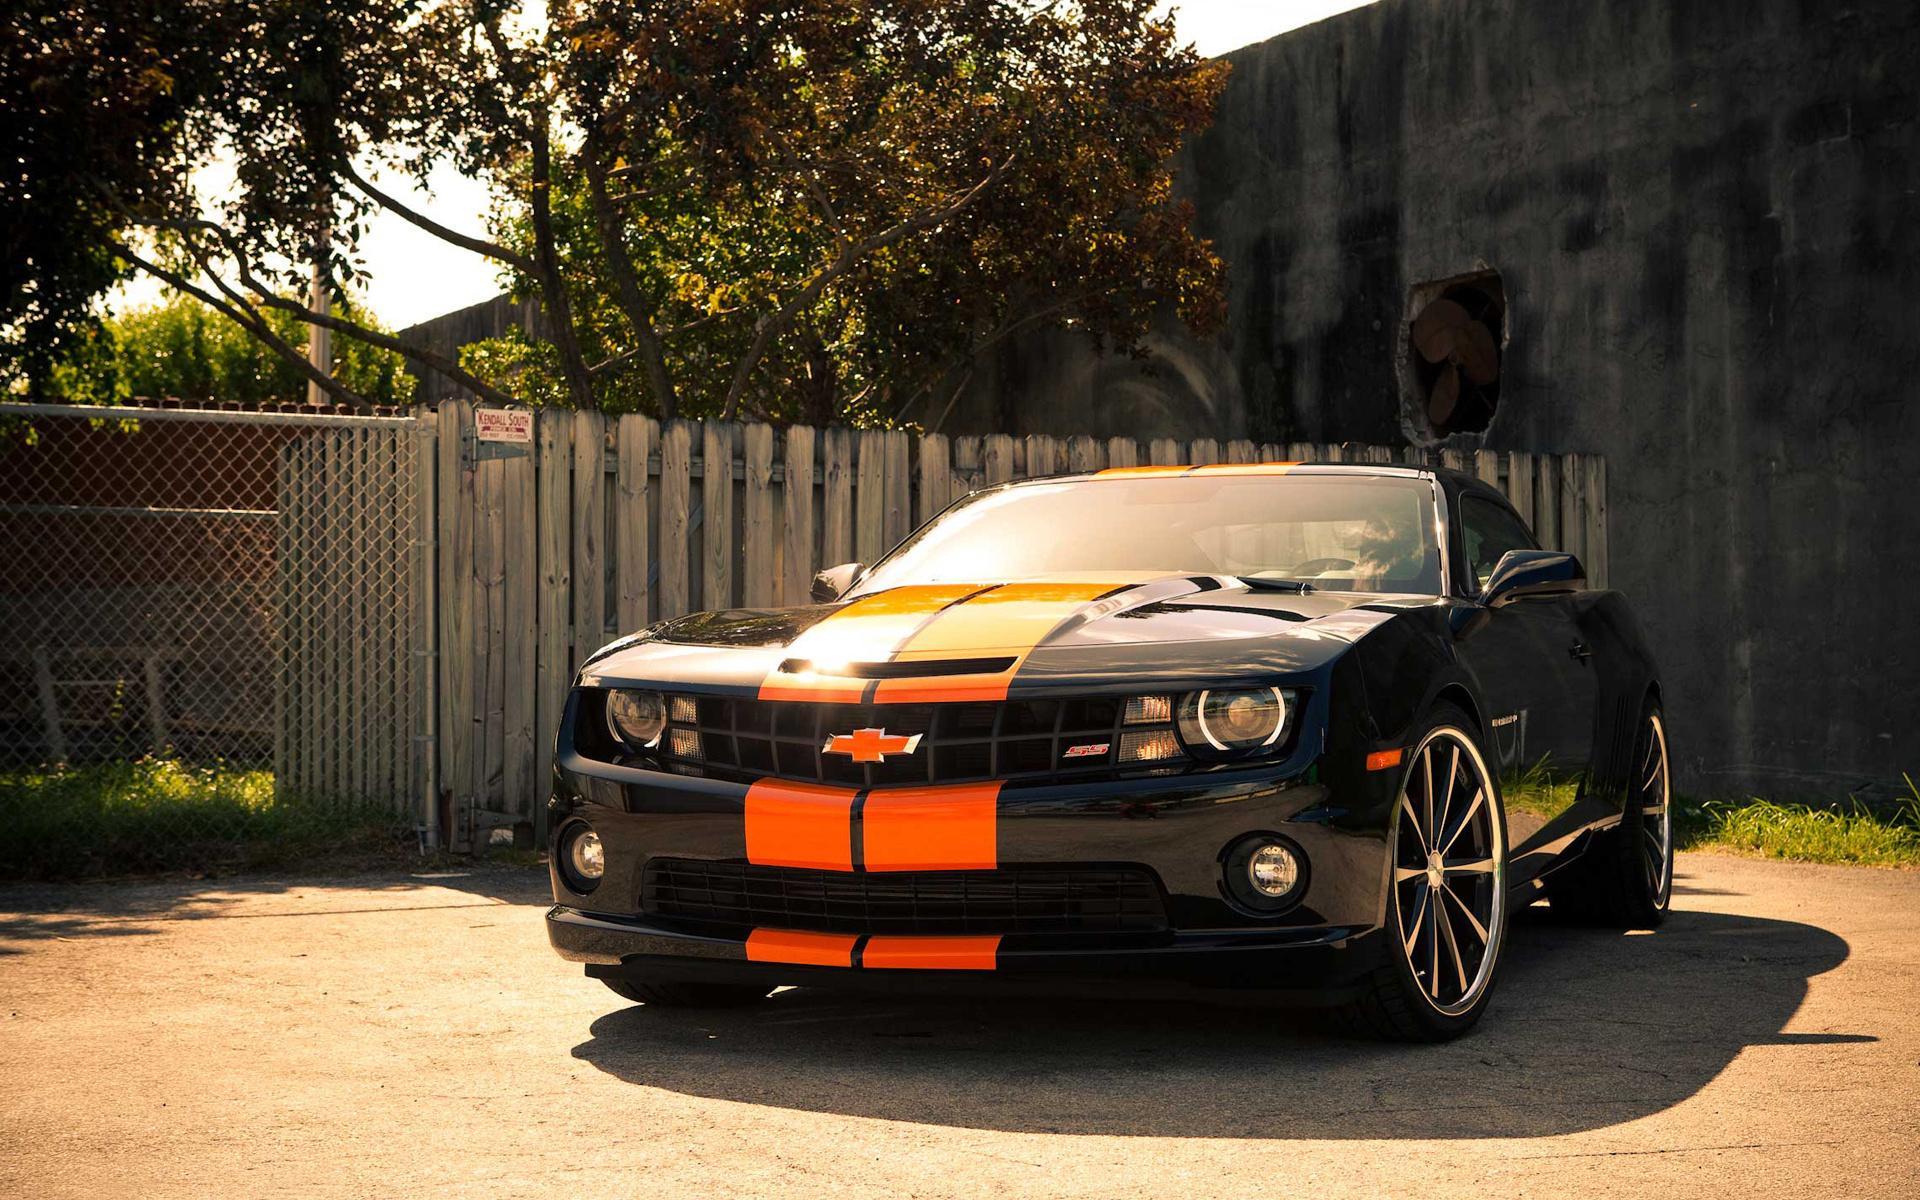 Chevrolet Camaro Ss Car Hd Wallpaper